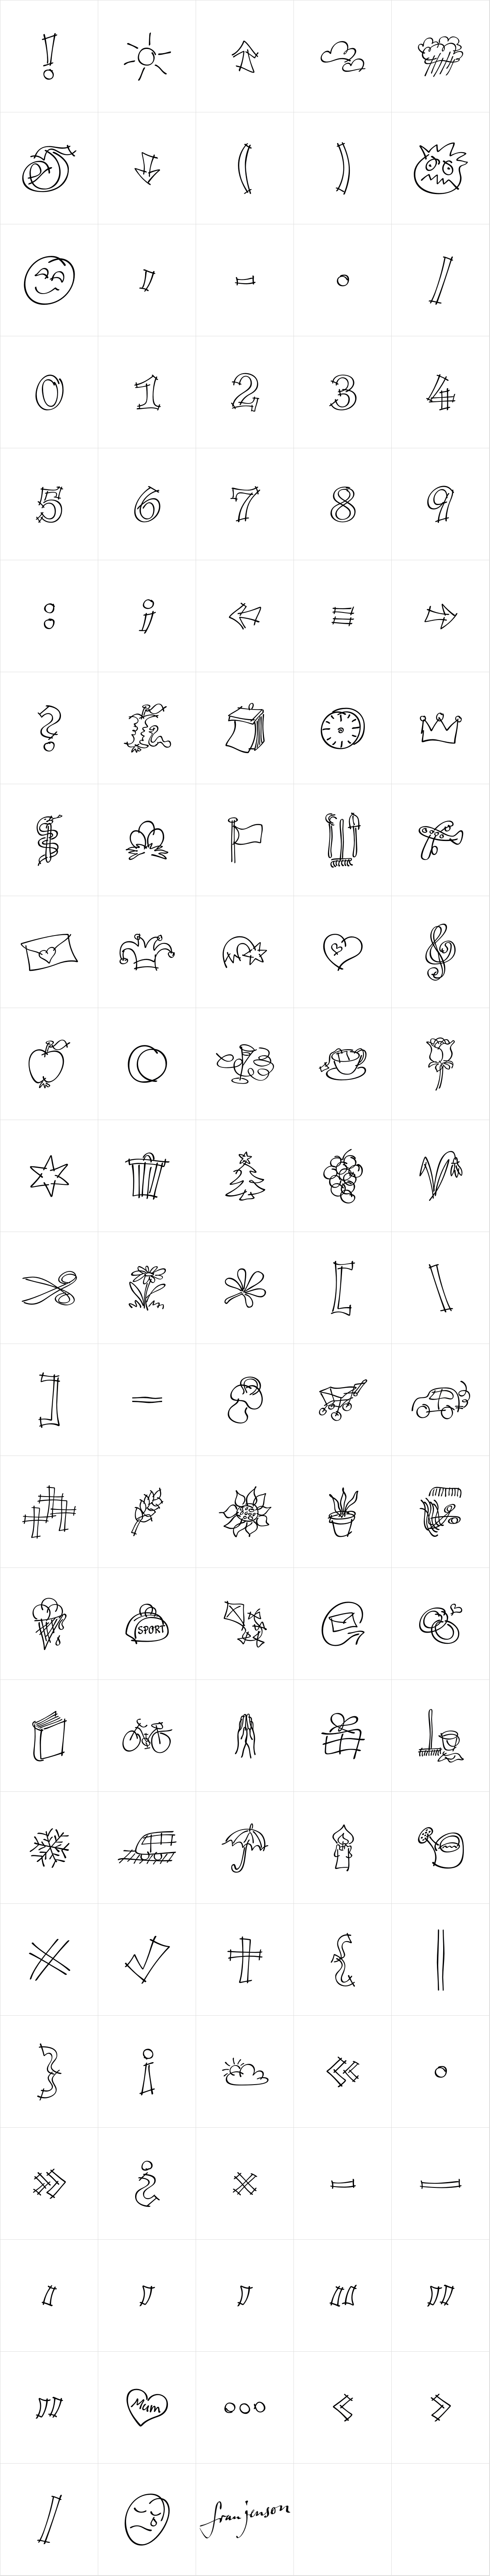 P22 Tulda Symbols